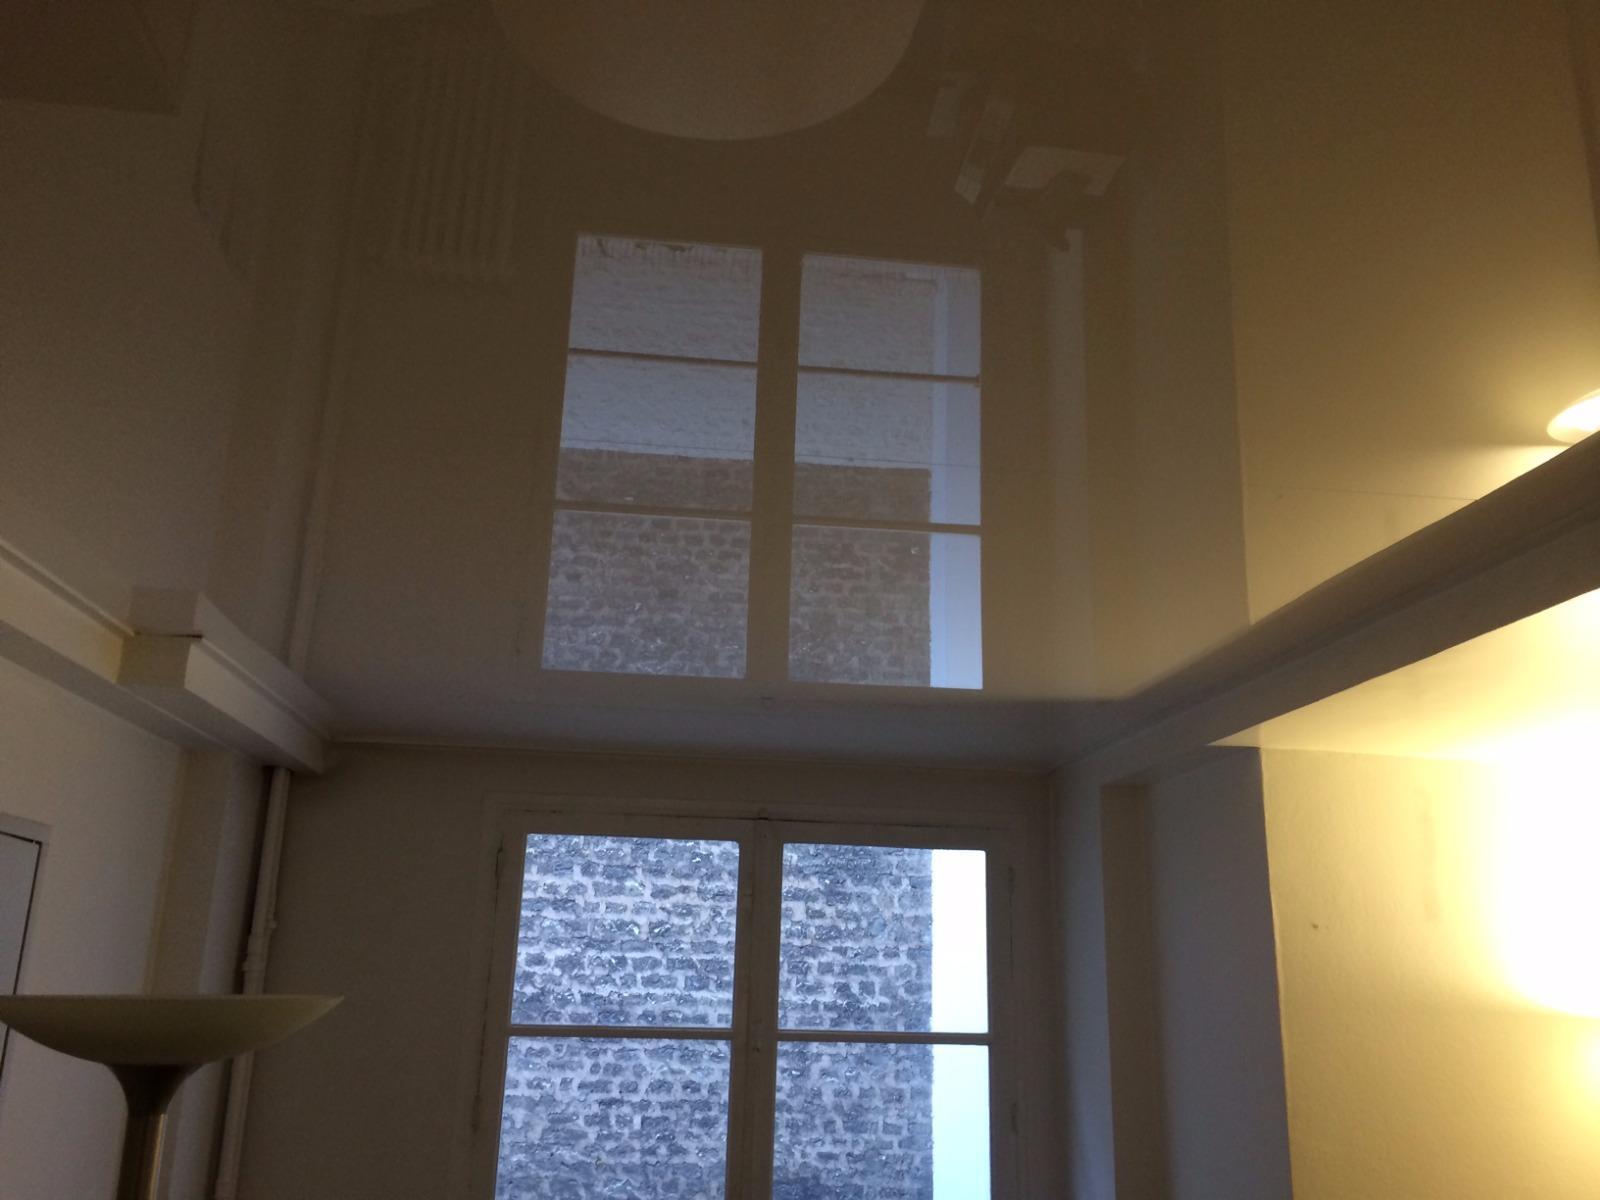 Plafond tendu paris hotel avec miroir au plafond paris for Hotel miroir plafond